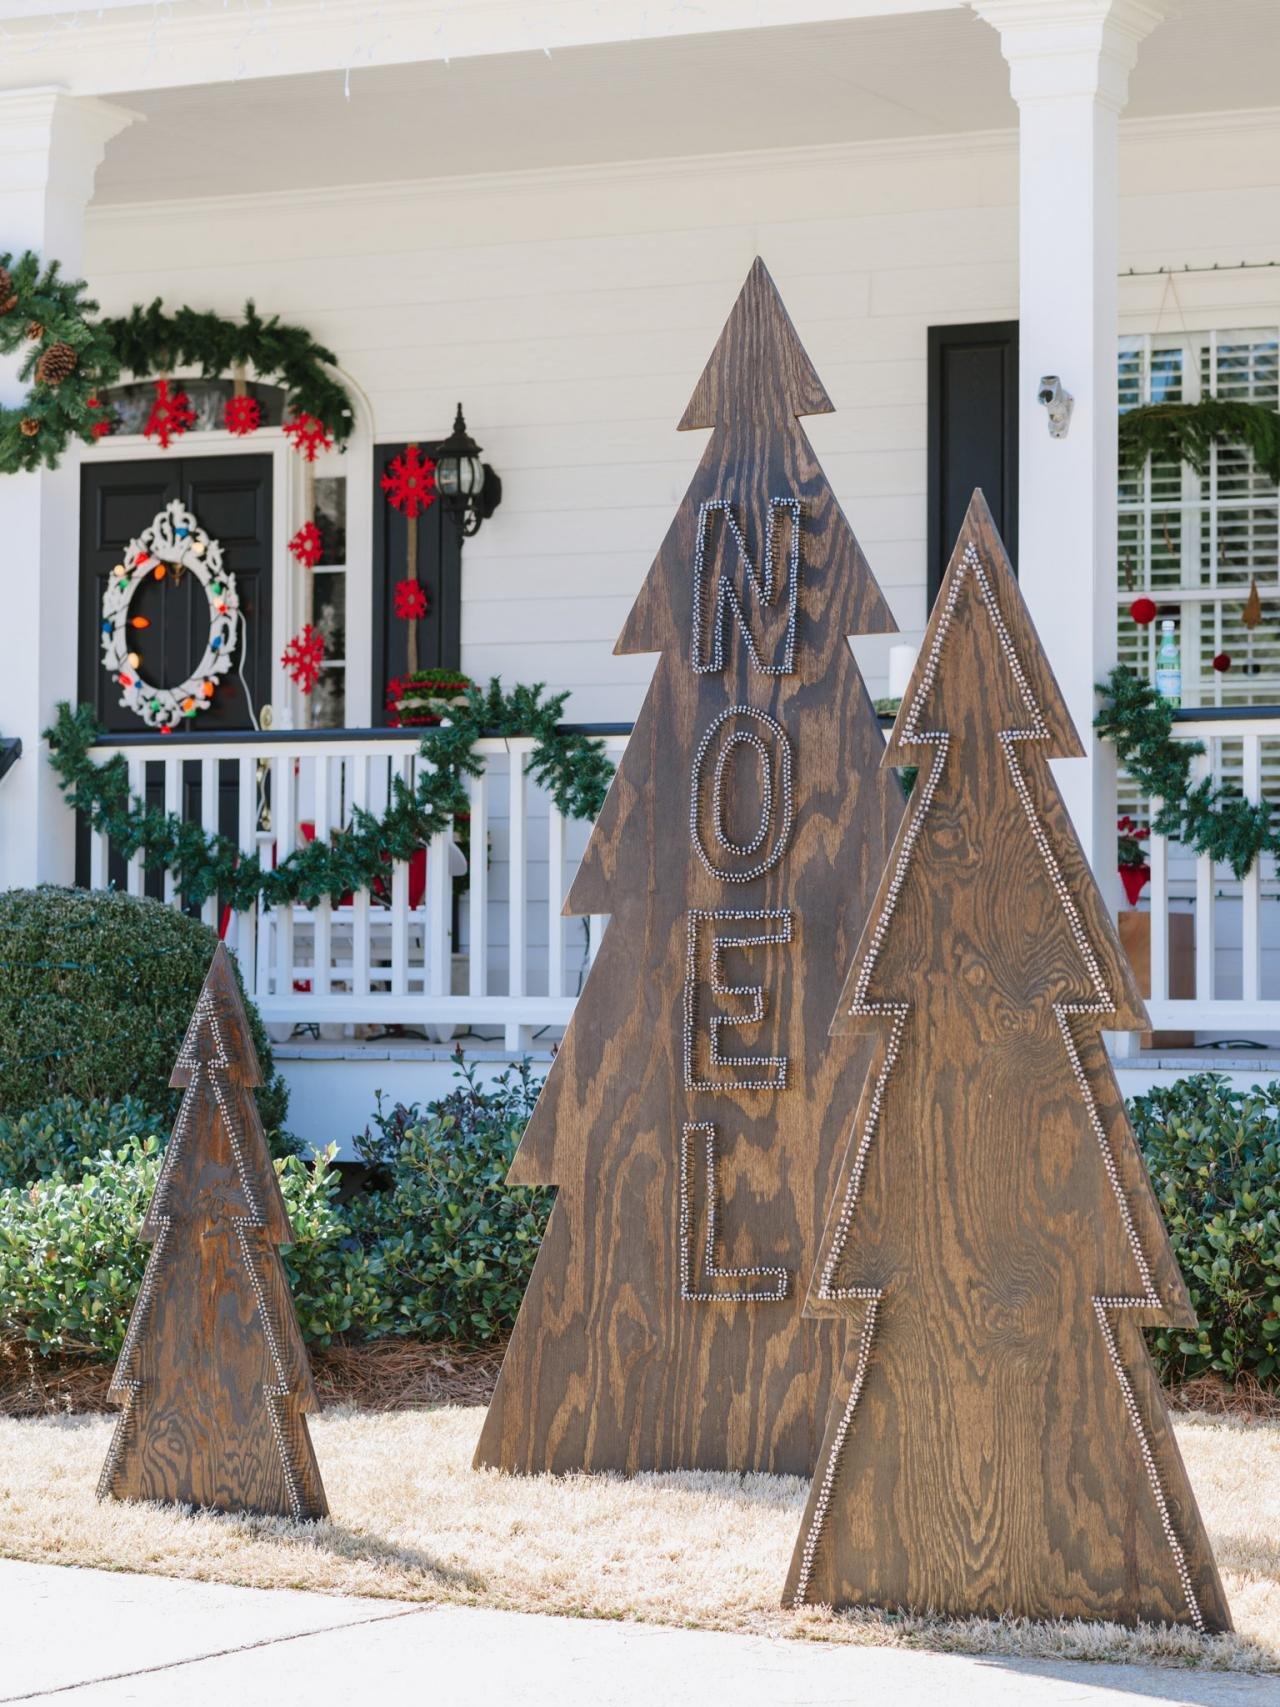 noel wooden christmas trees decoration idea